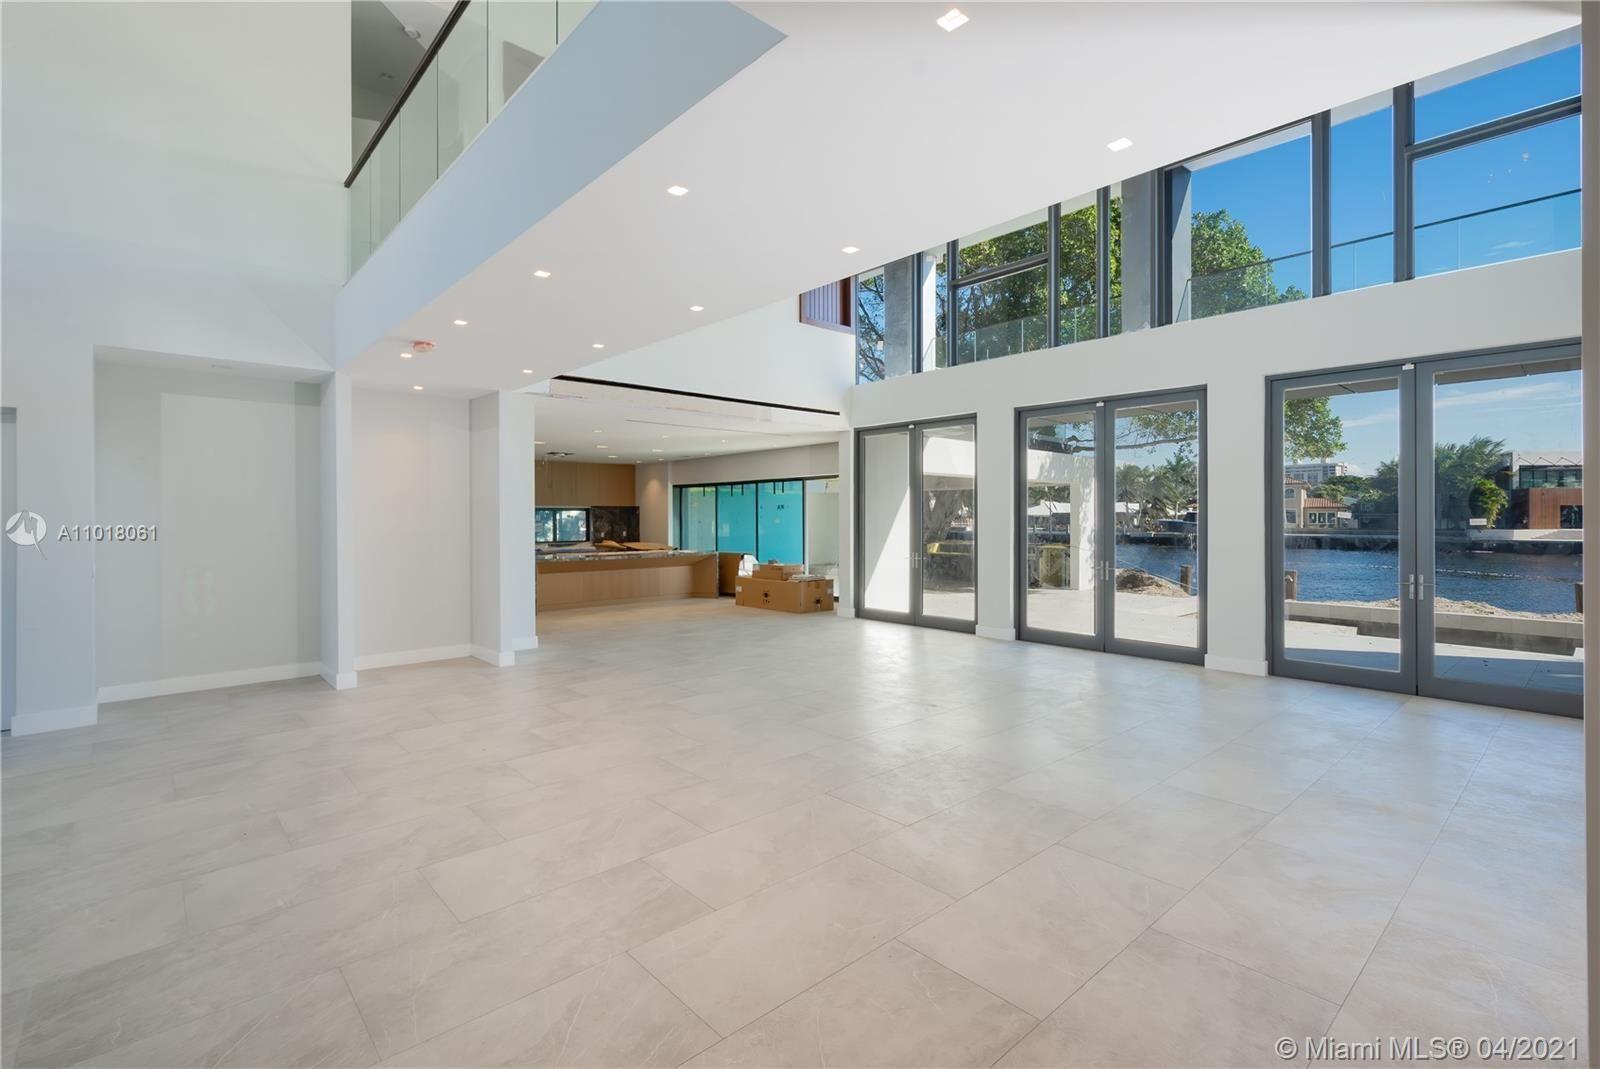 3250 NE 56th Ct, Fort Lauderdale, FL 33308 - #: A11018061